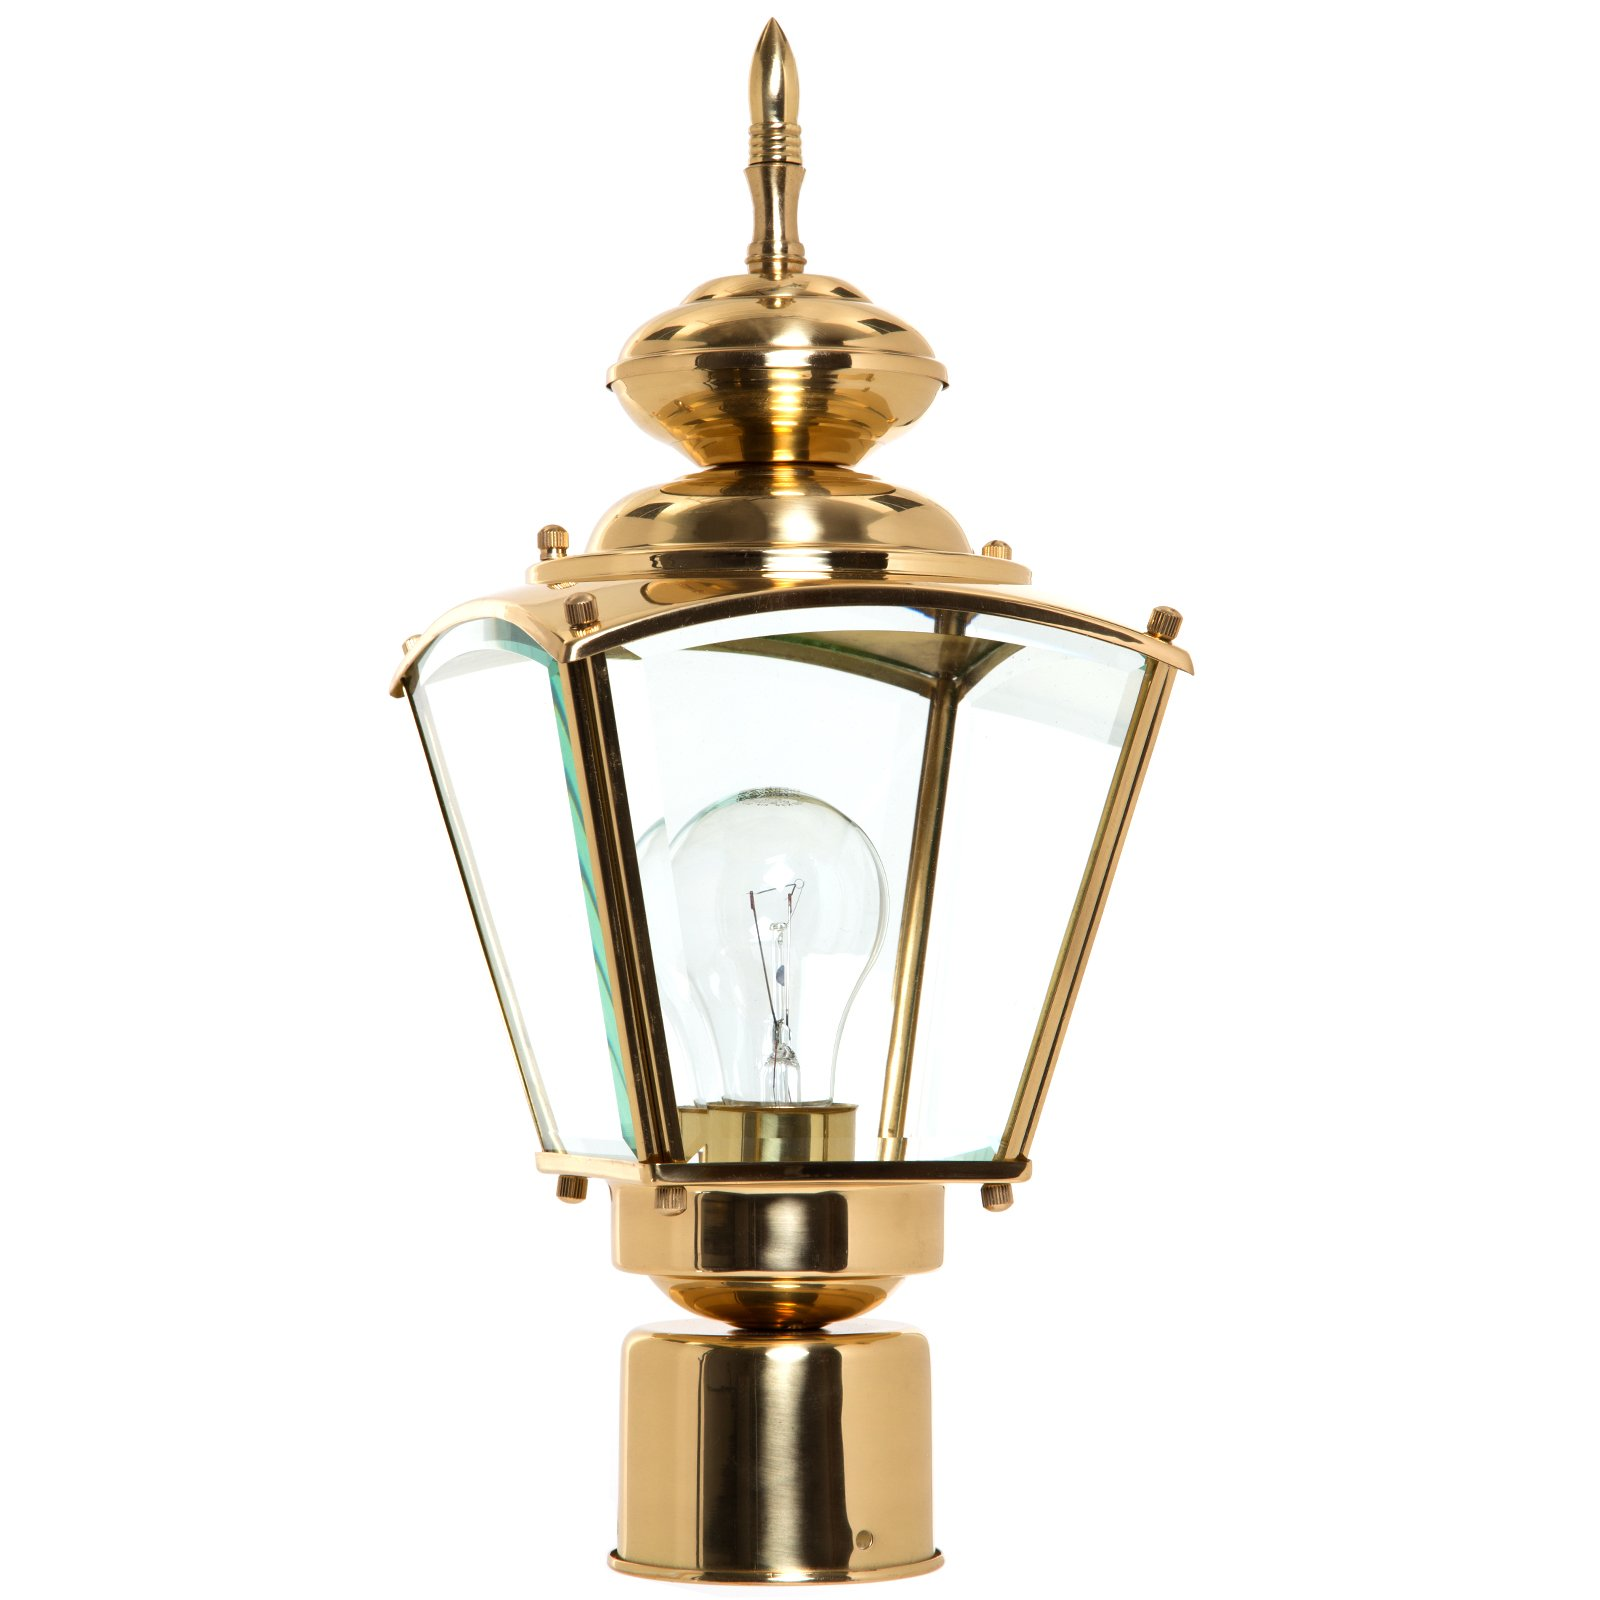 Boston Harbor 4007H2 1-Light Post Coach Lantern, Brass by Boston Harbor